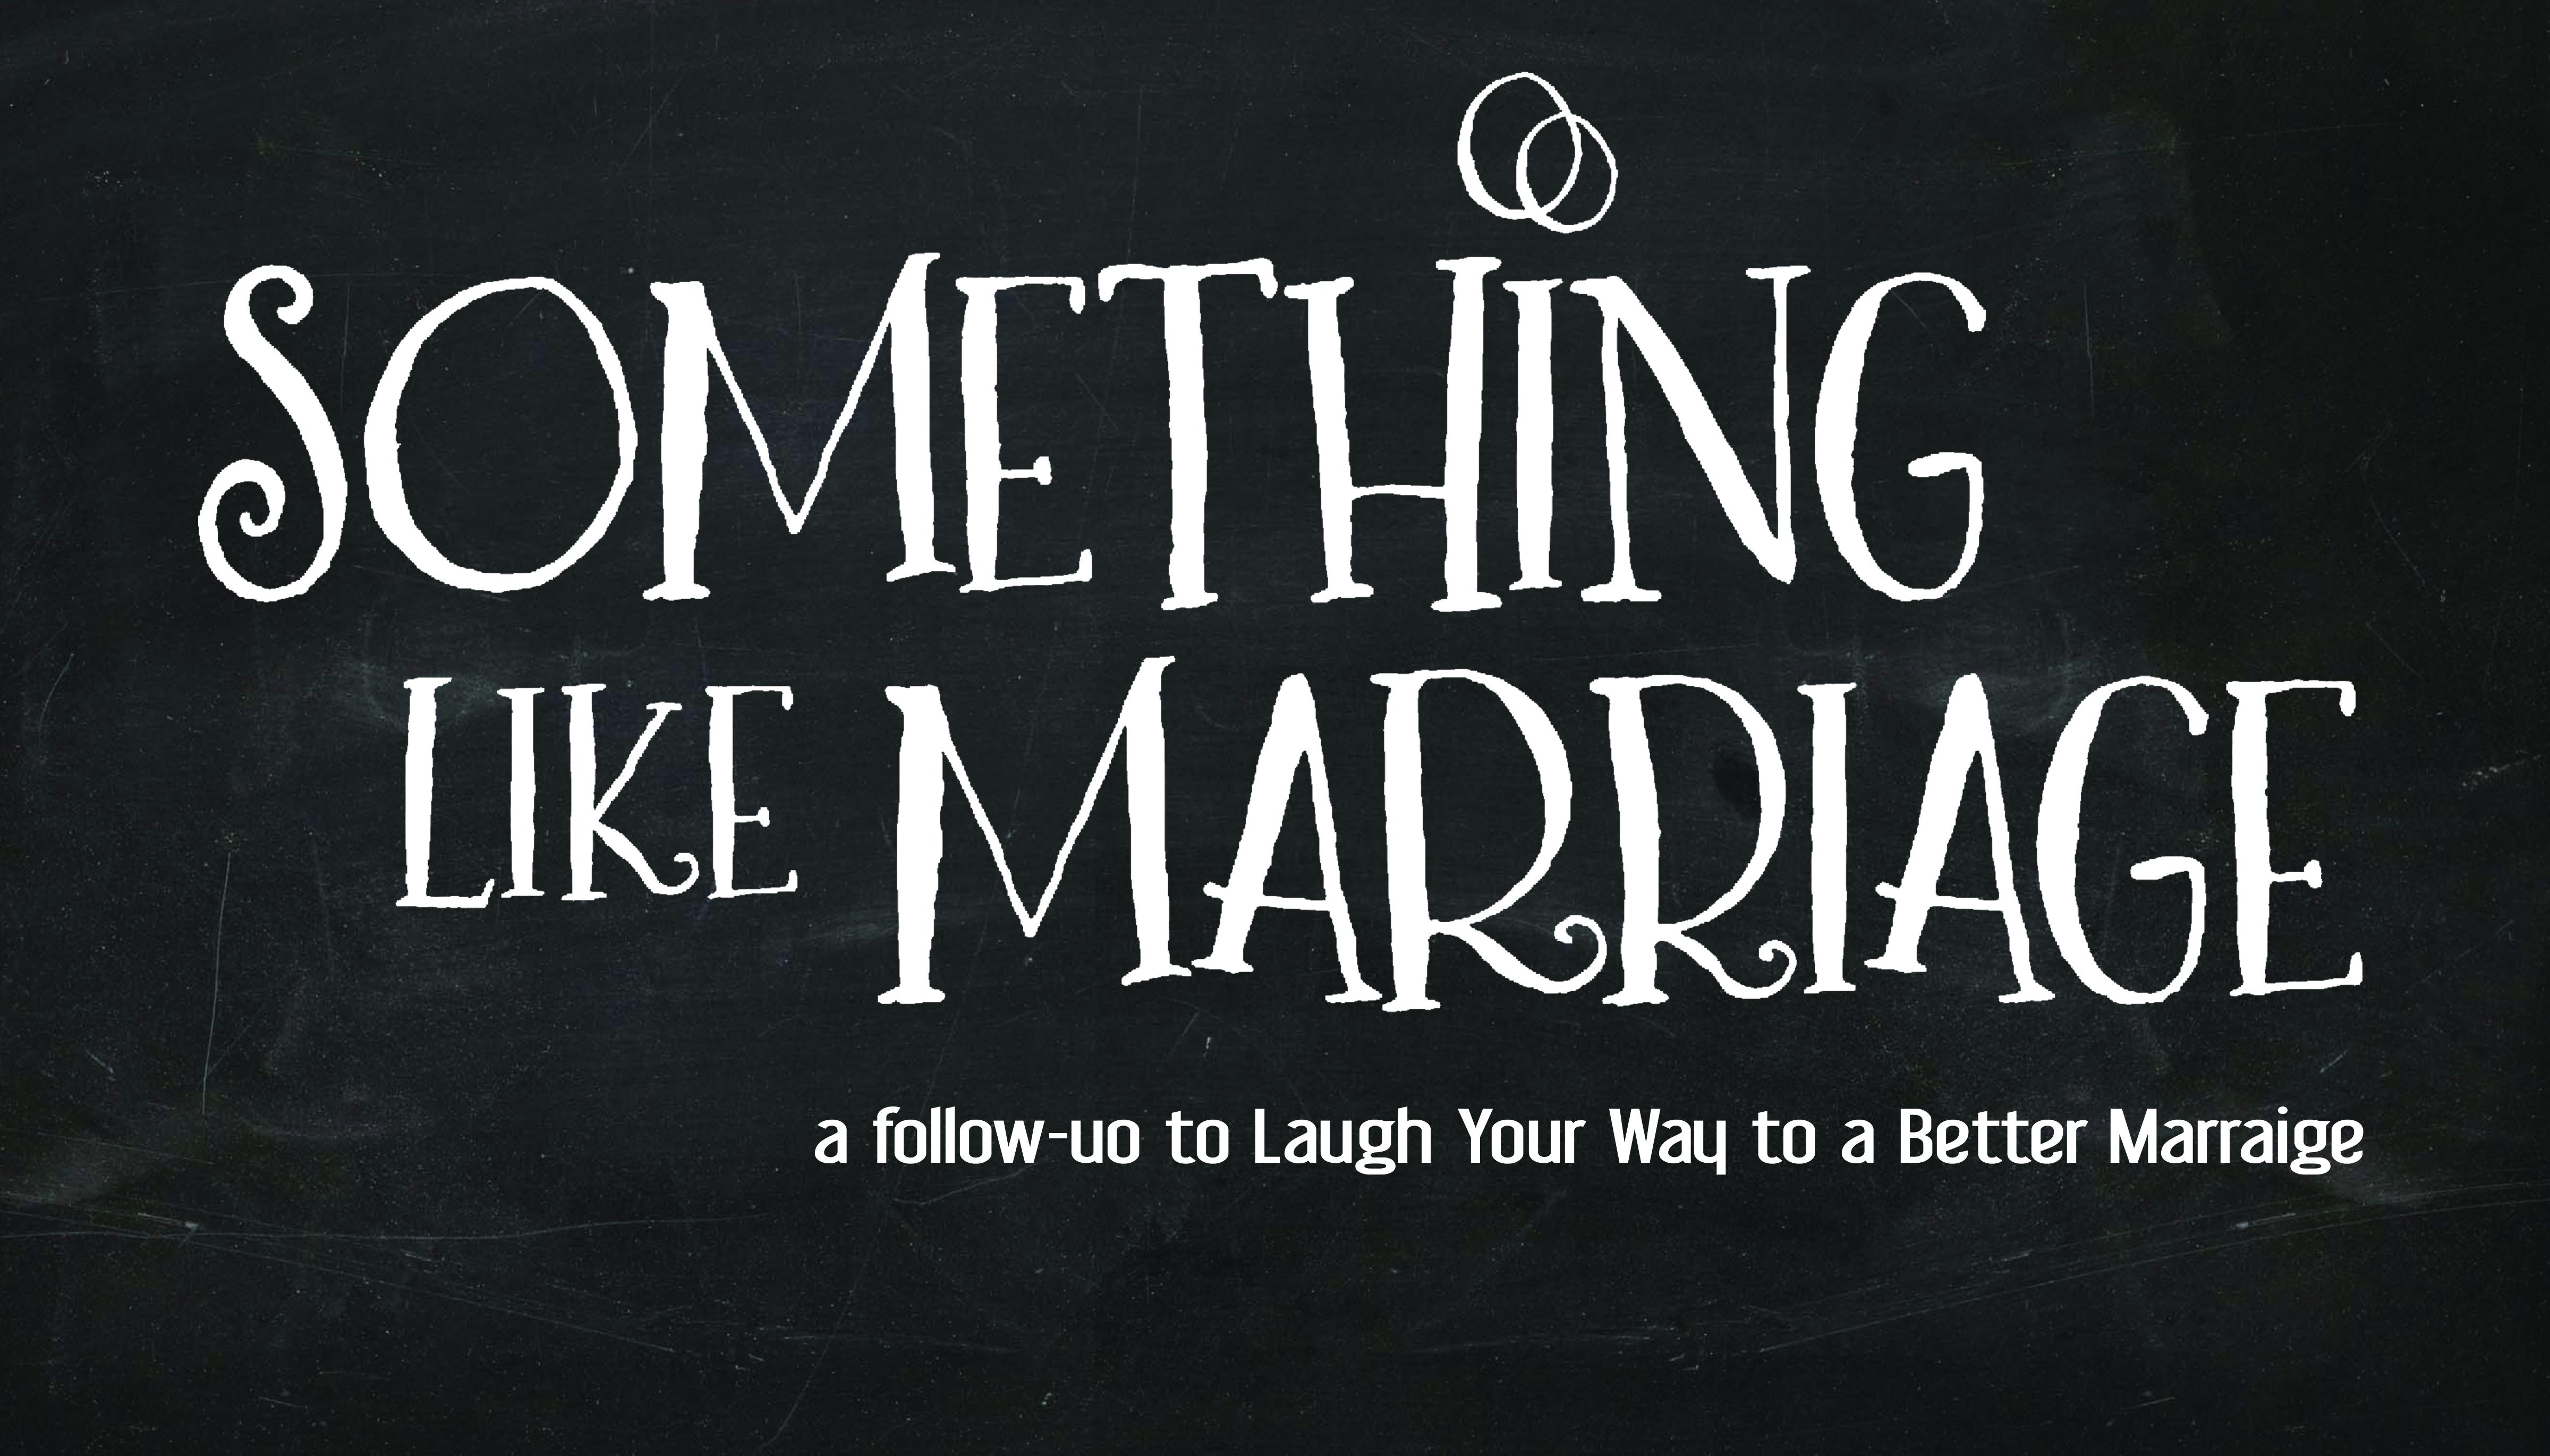 Enew something marriage